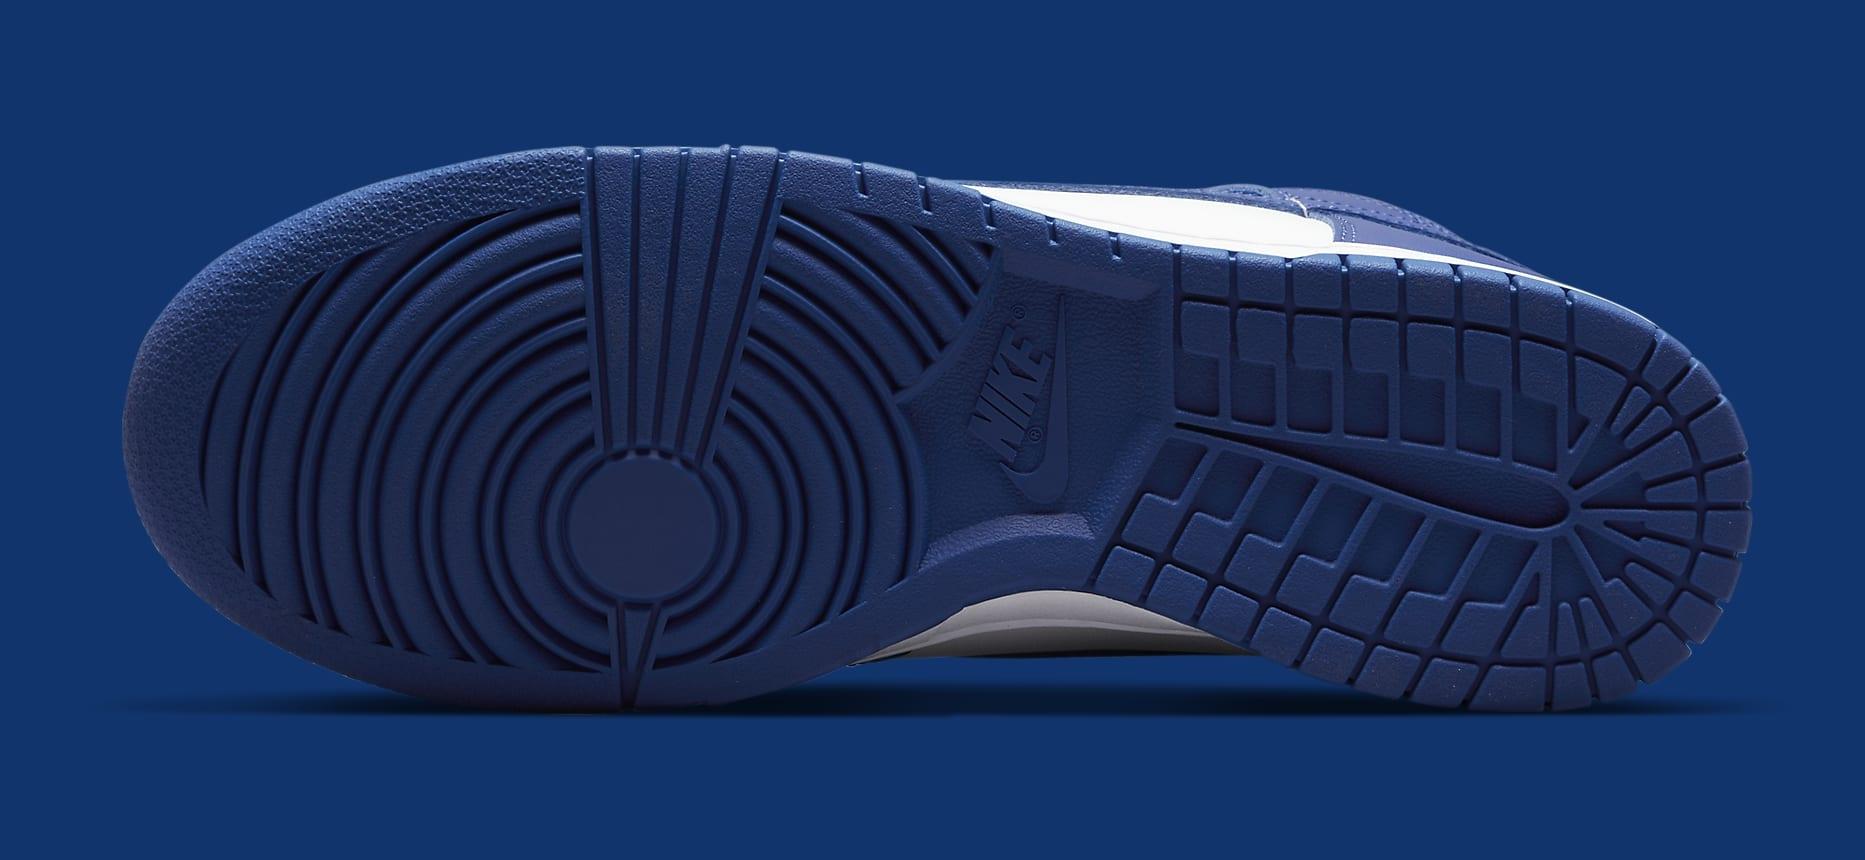 Nike Dunk High 'Kentucky' DD1399-102 Outsole